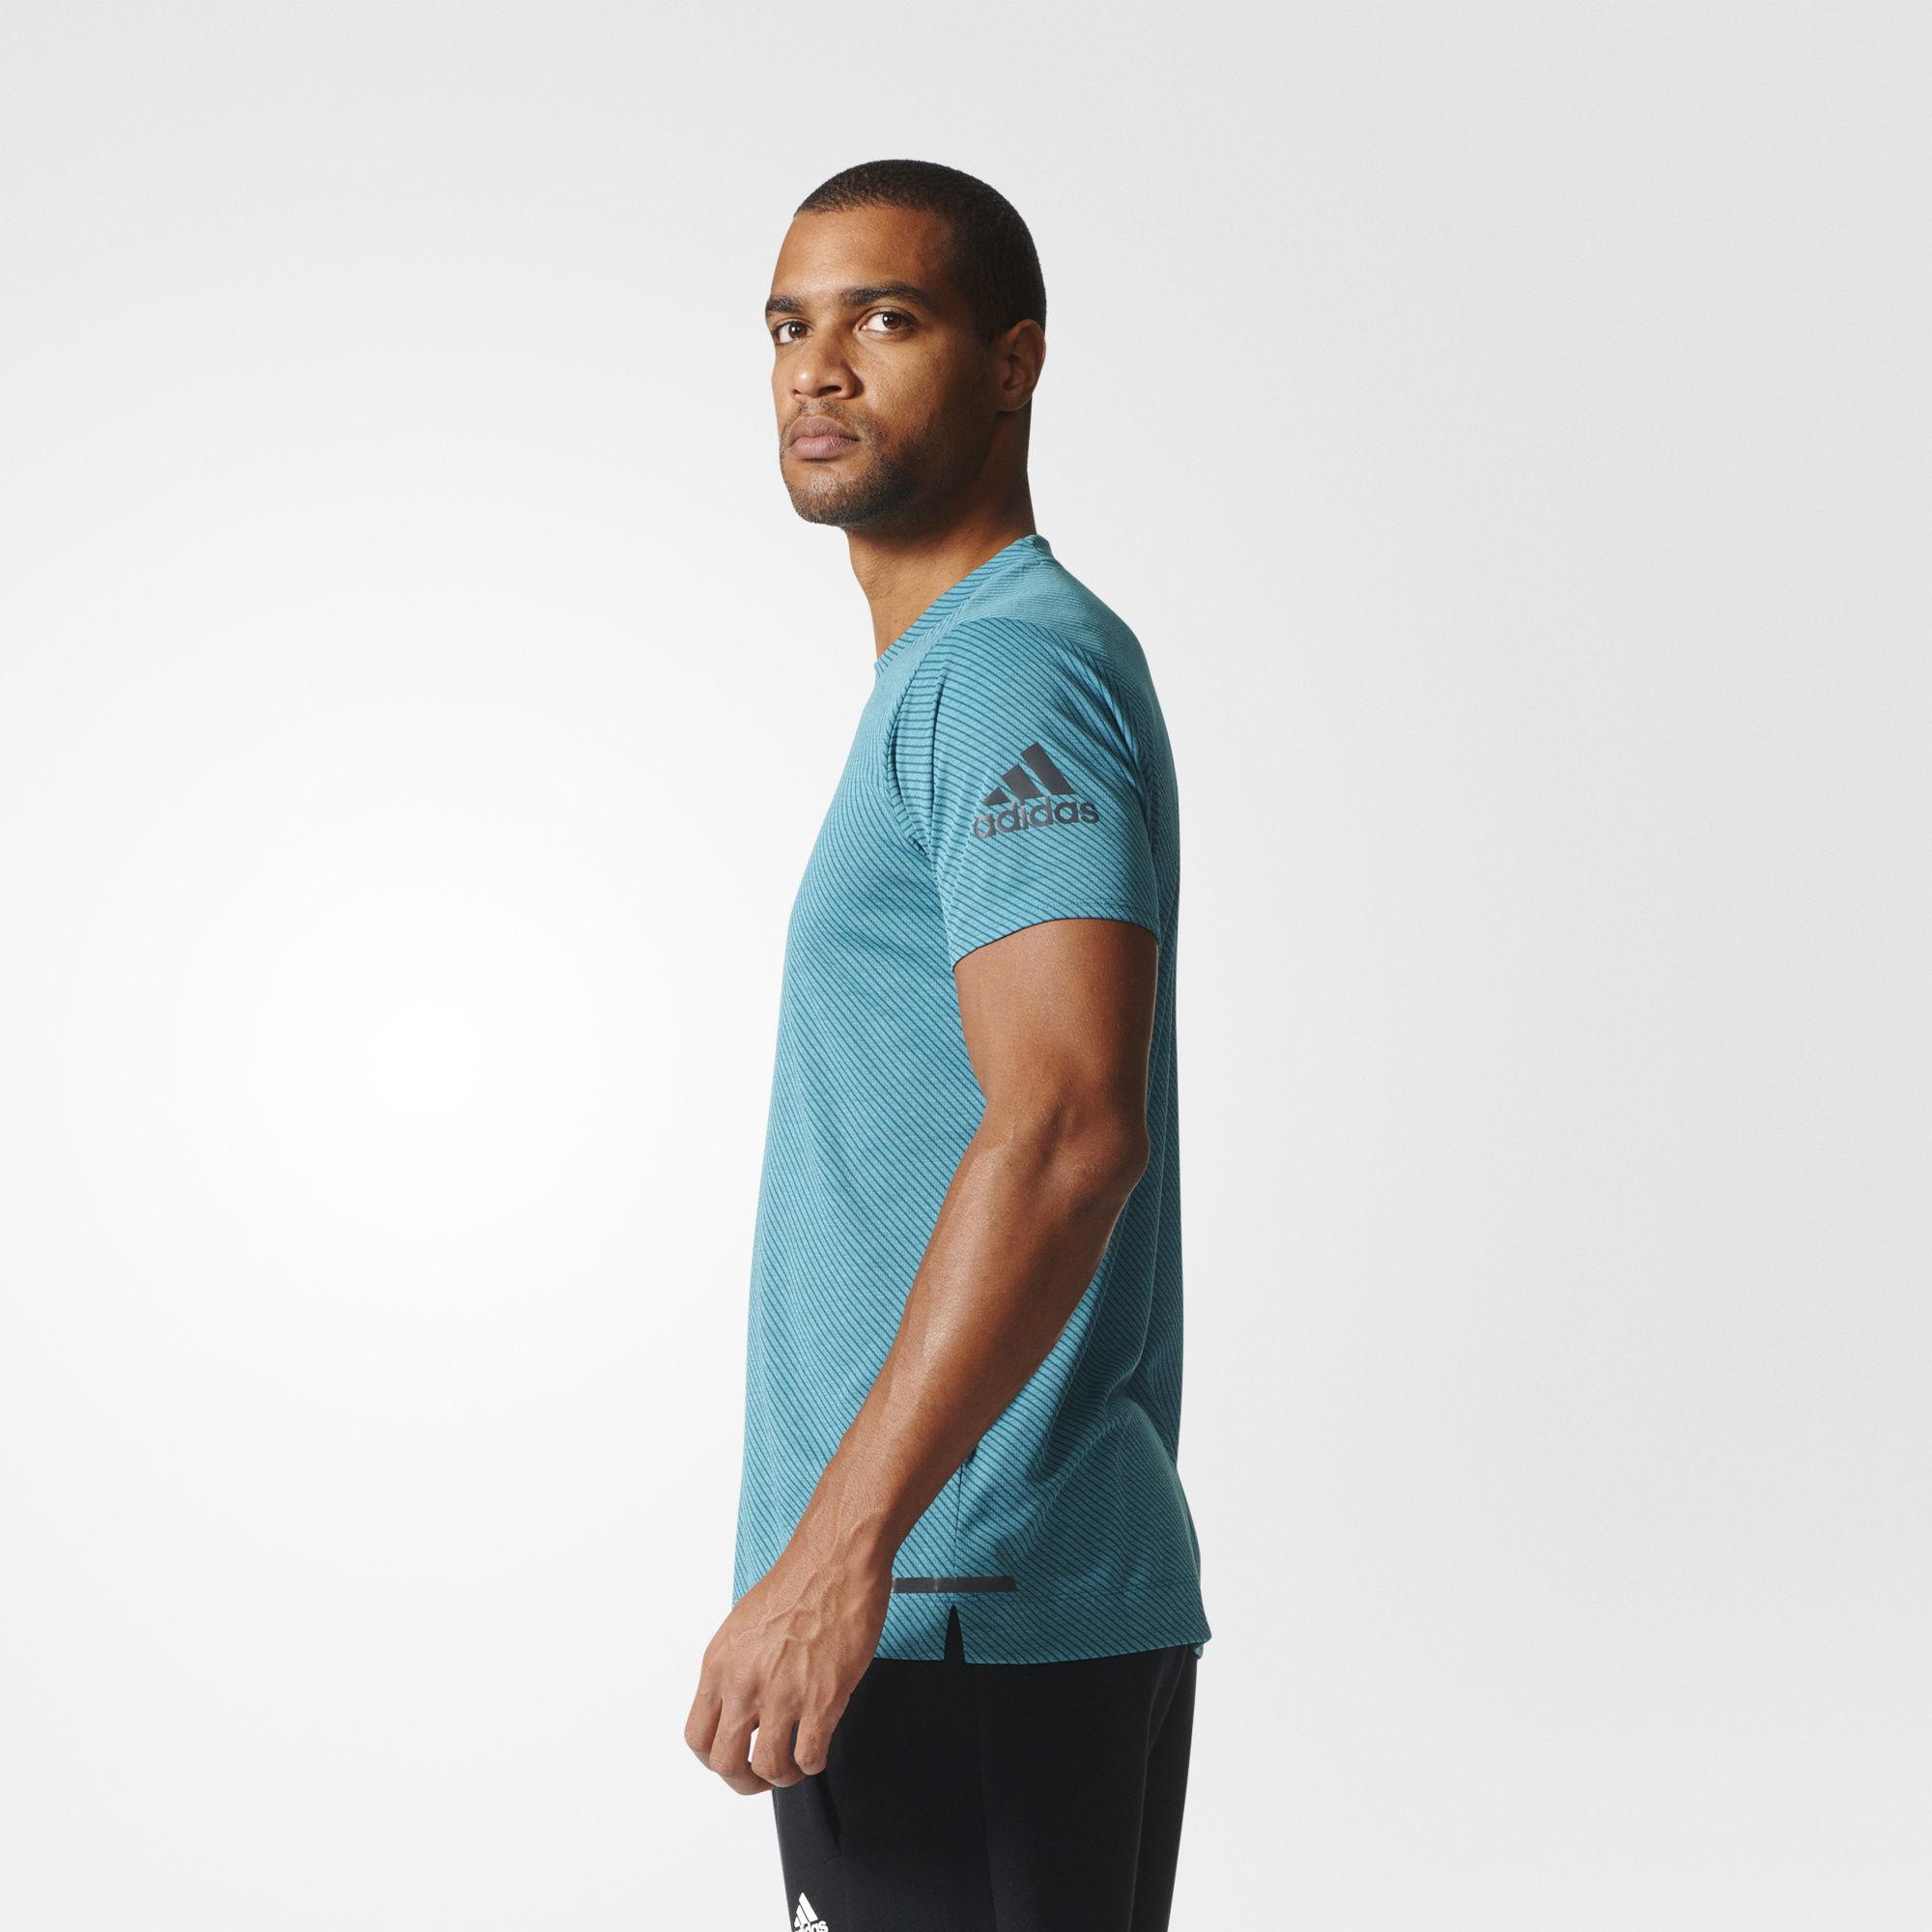 adidas freelift chill t shirt